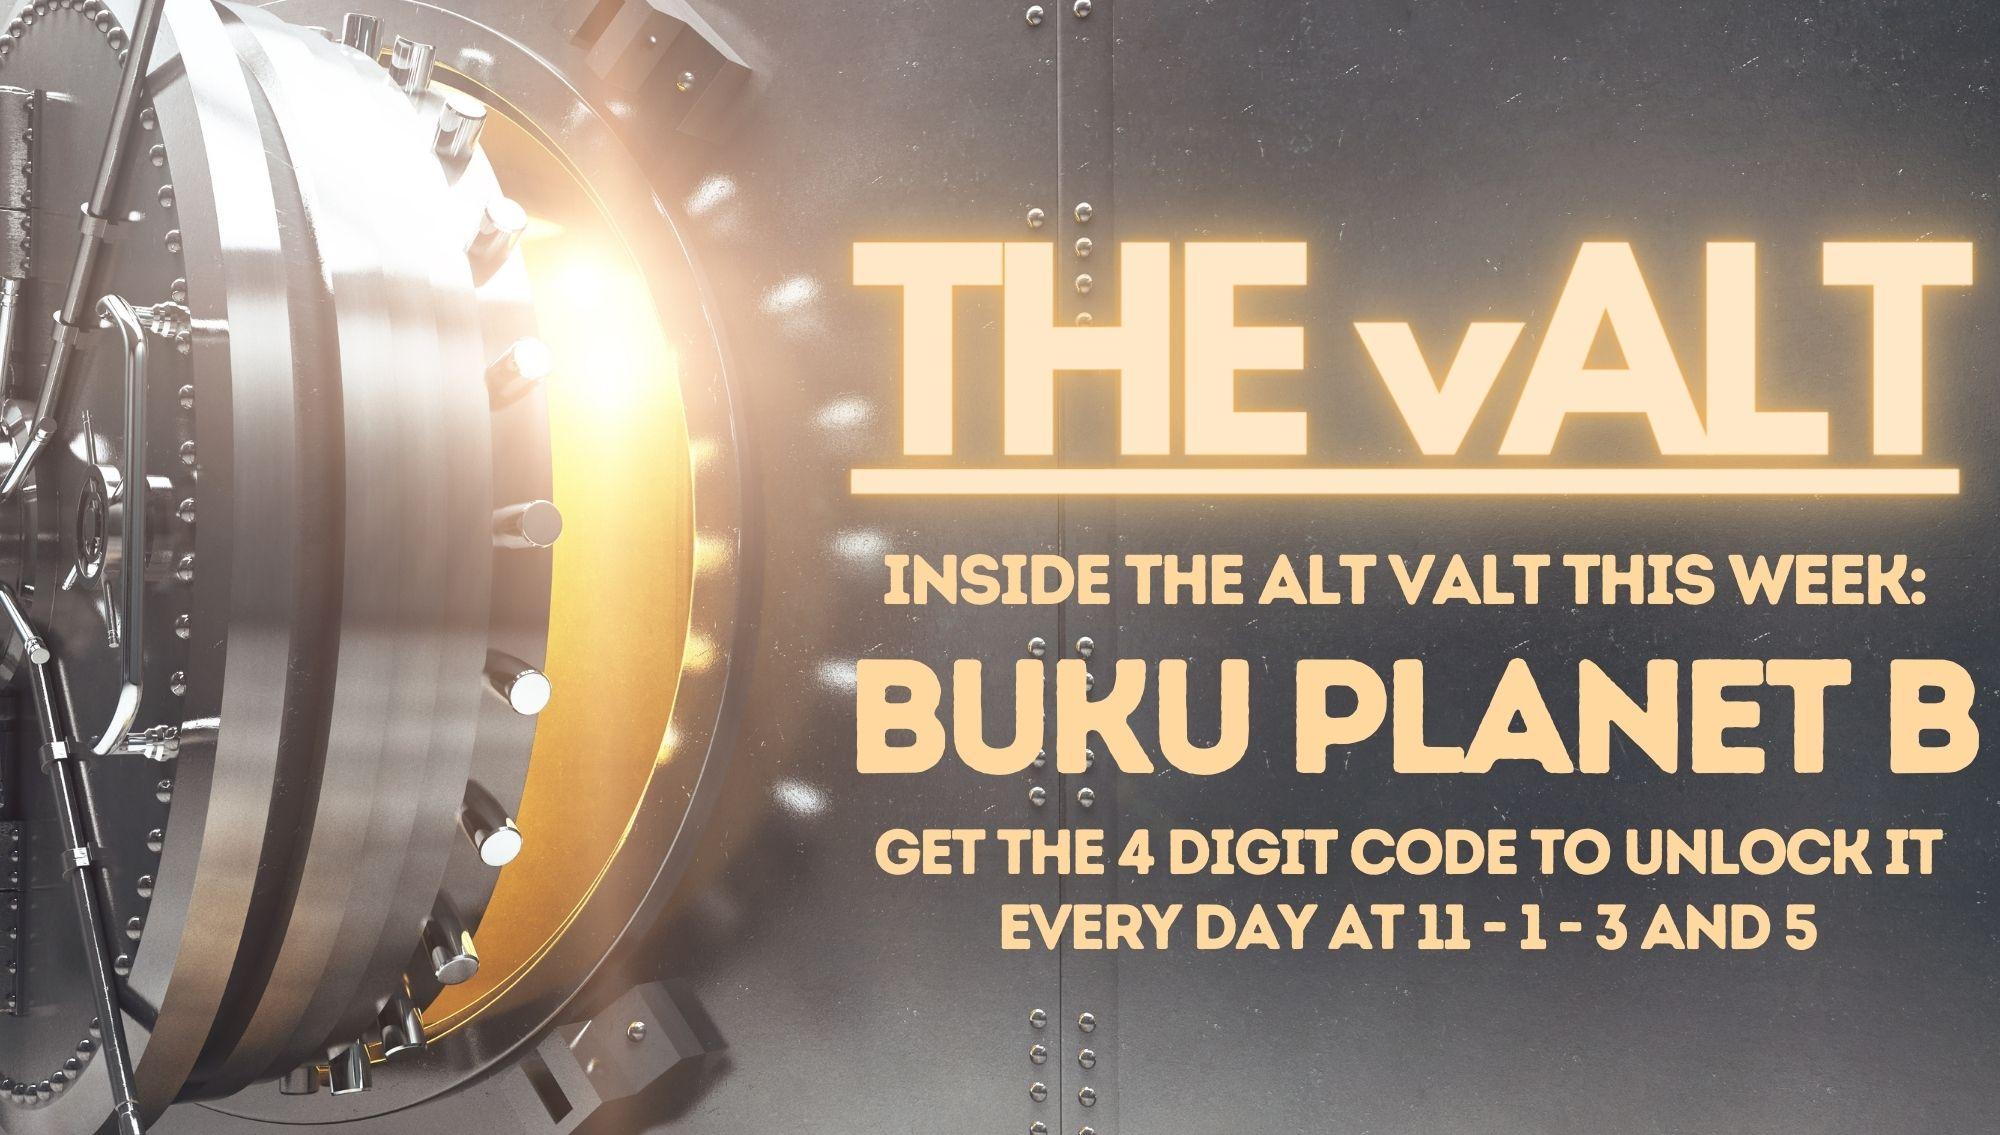 The VALT